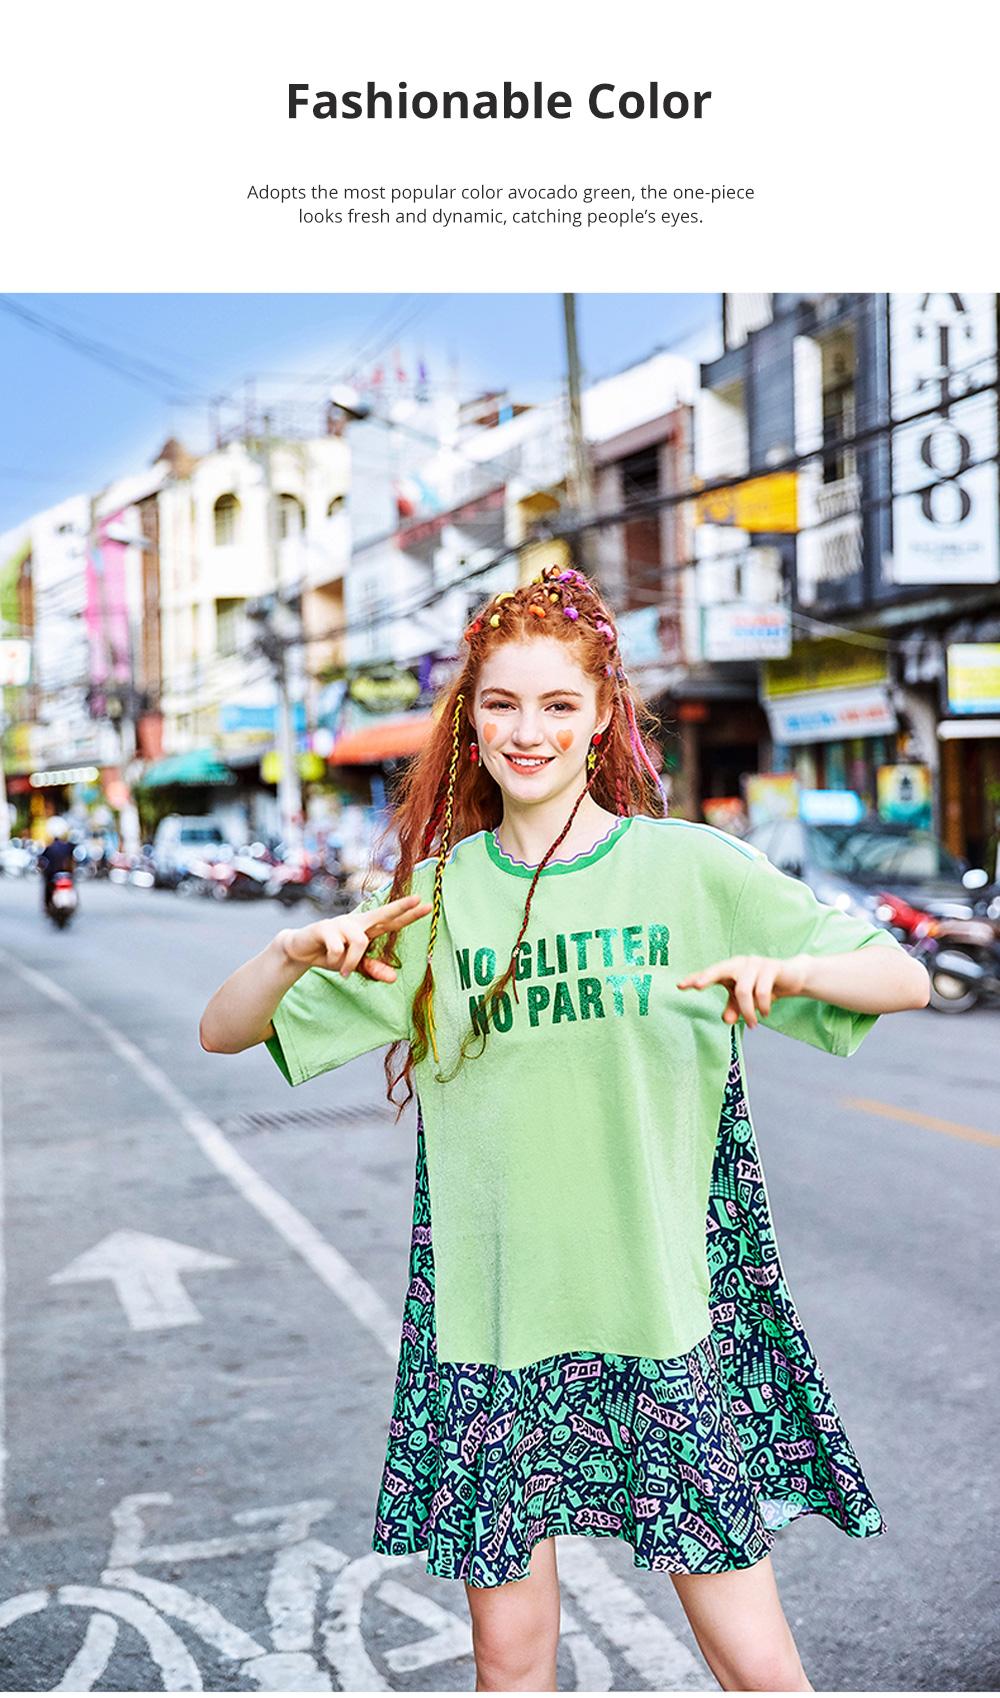 Summer New European Style Fashionable Avocado Green One-piece Fresh Leisure A-shape Dress For Girls Womens 4